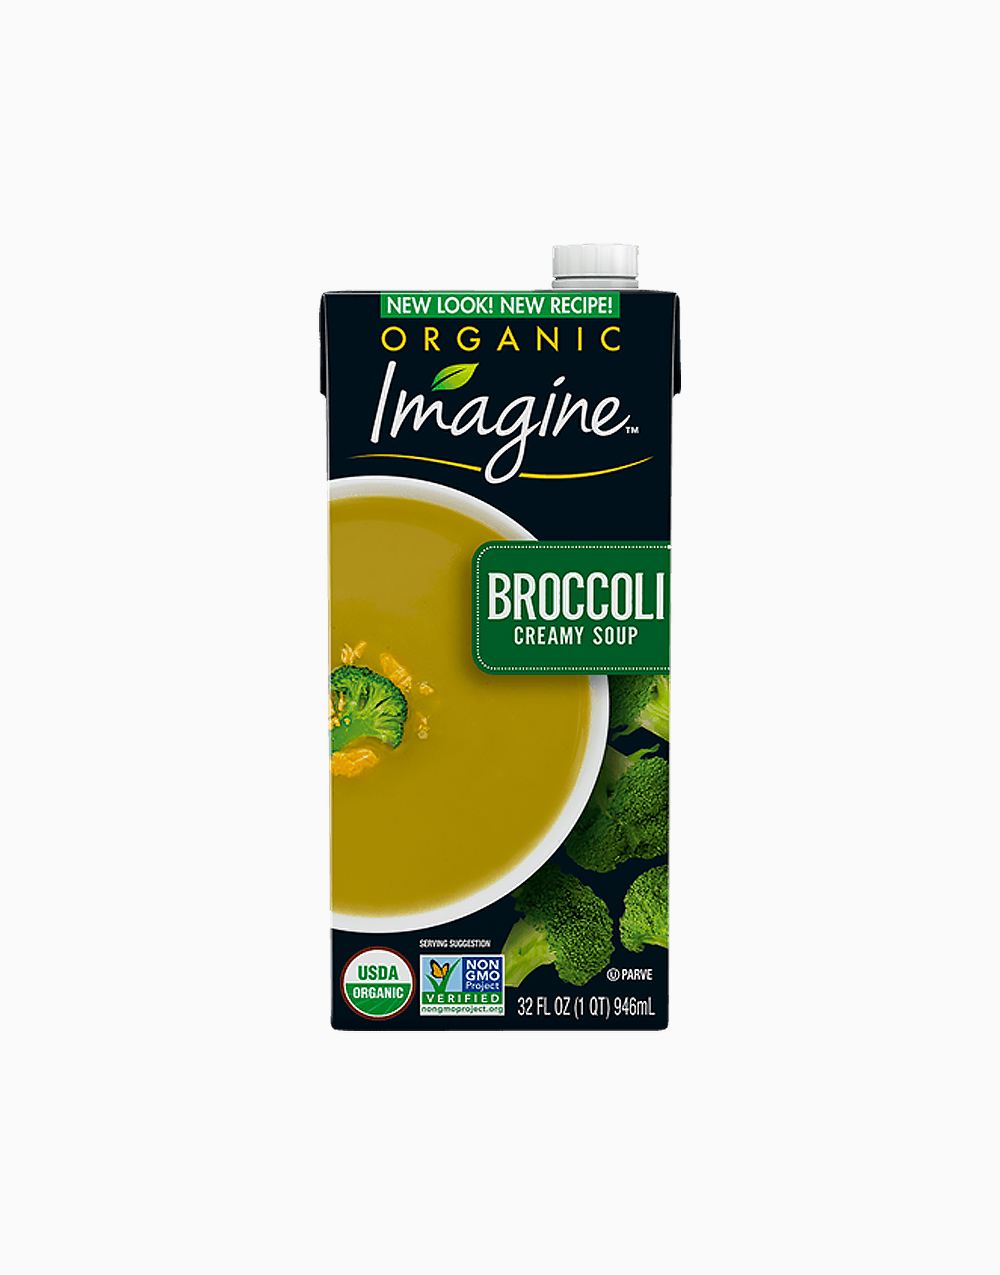 Organic Broccoli Creamy Soup (32oz) by Imagine